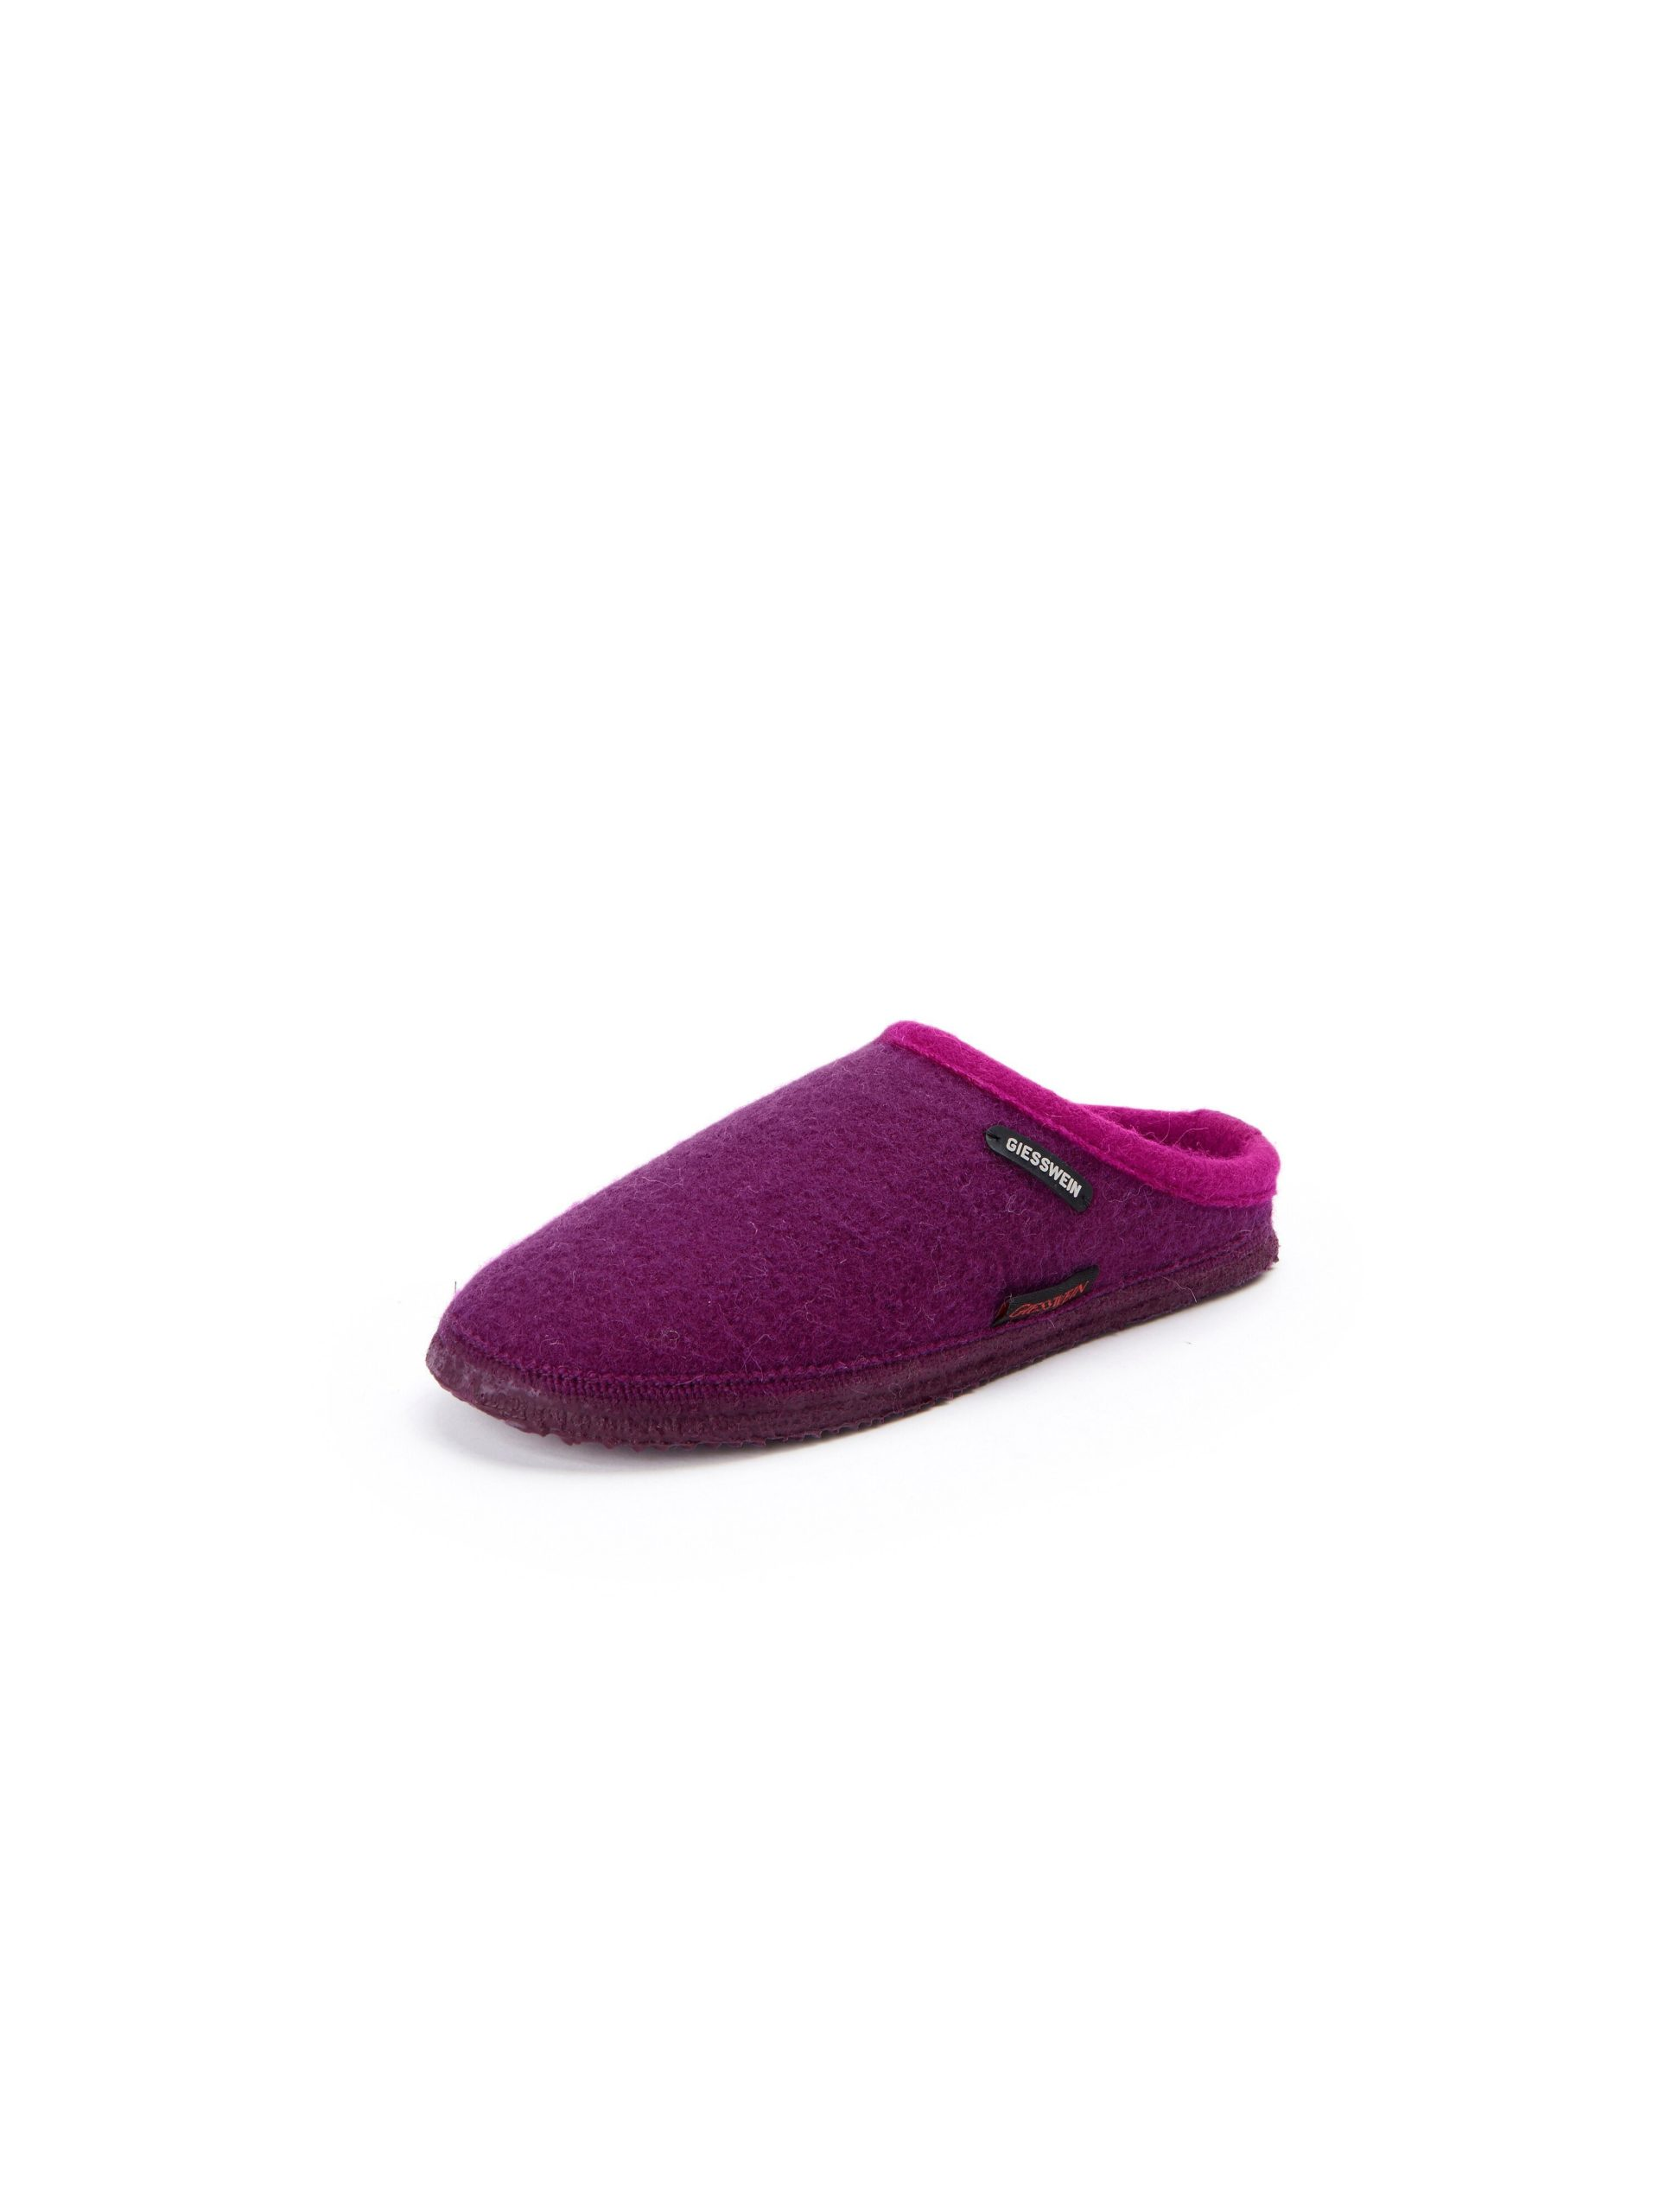 Pantoffels, model Dannheim Van Giesswein roze Kopen